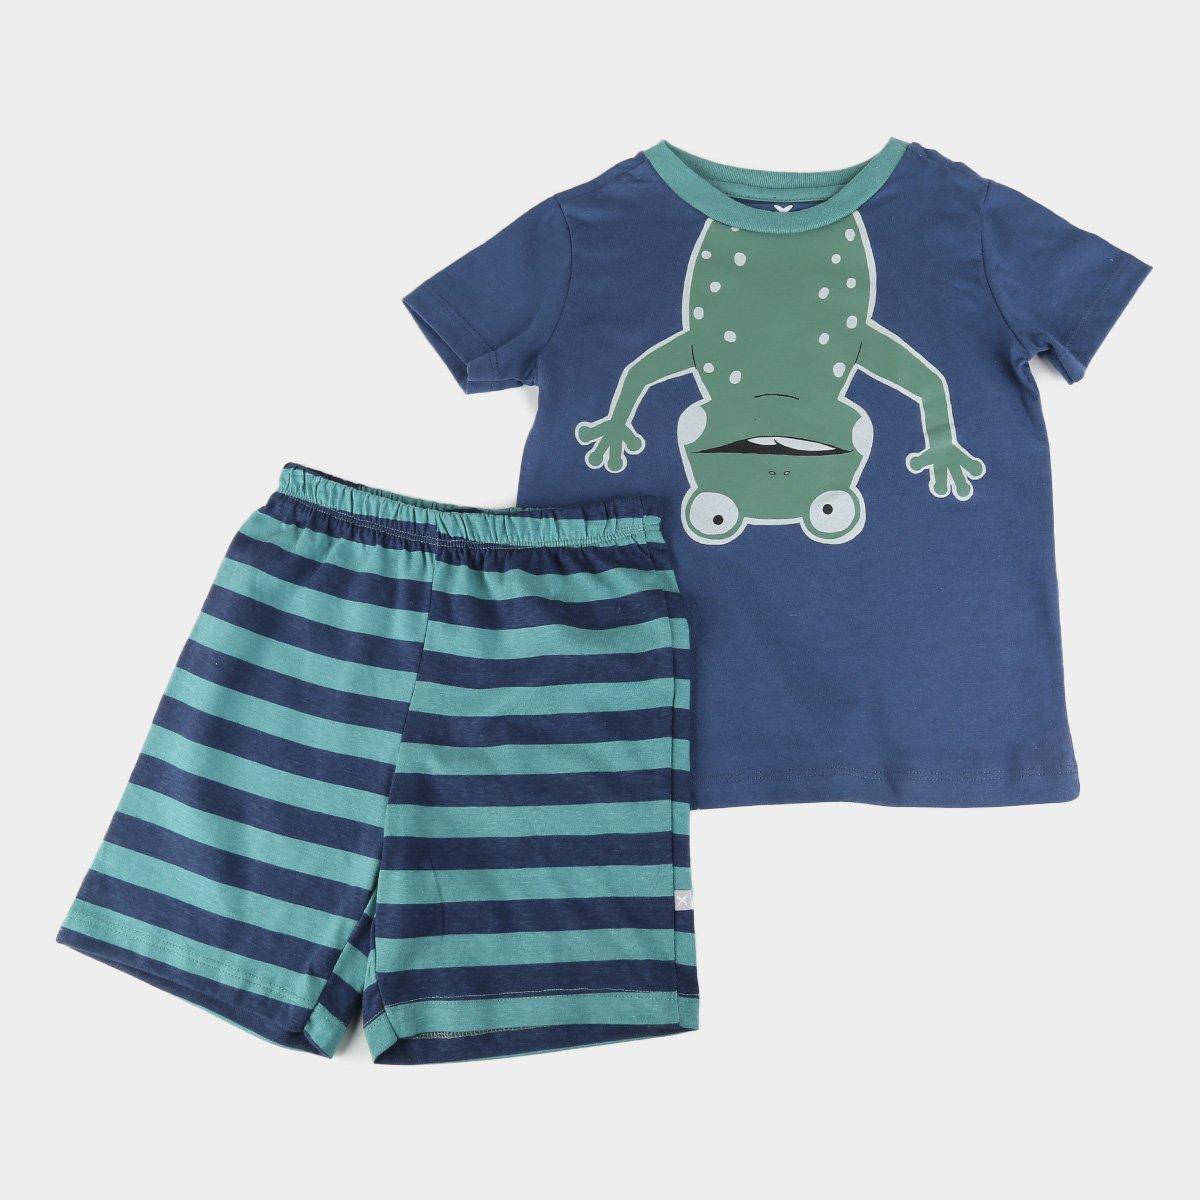 Pijama Infantil Hering Kids Curto Sapinho Masculino